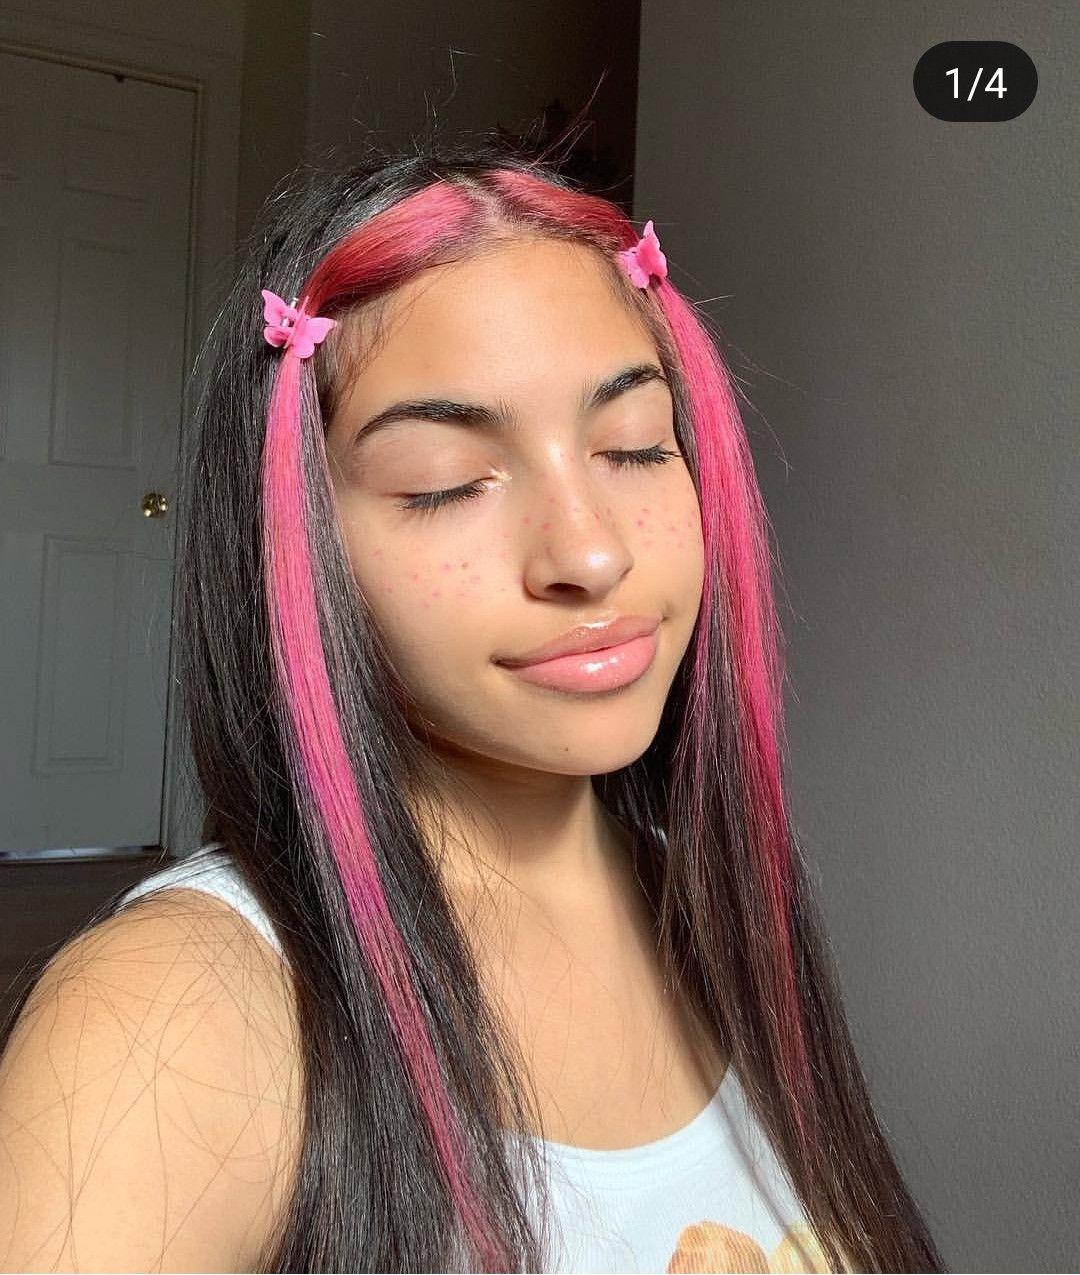 Pin By Emily Galloway On Hair Hair Color Streaks Pink Hair Streaks Aesthetic Hair